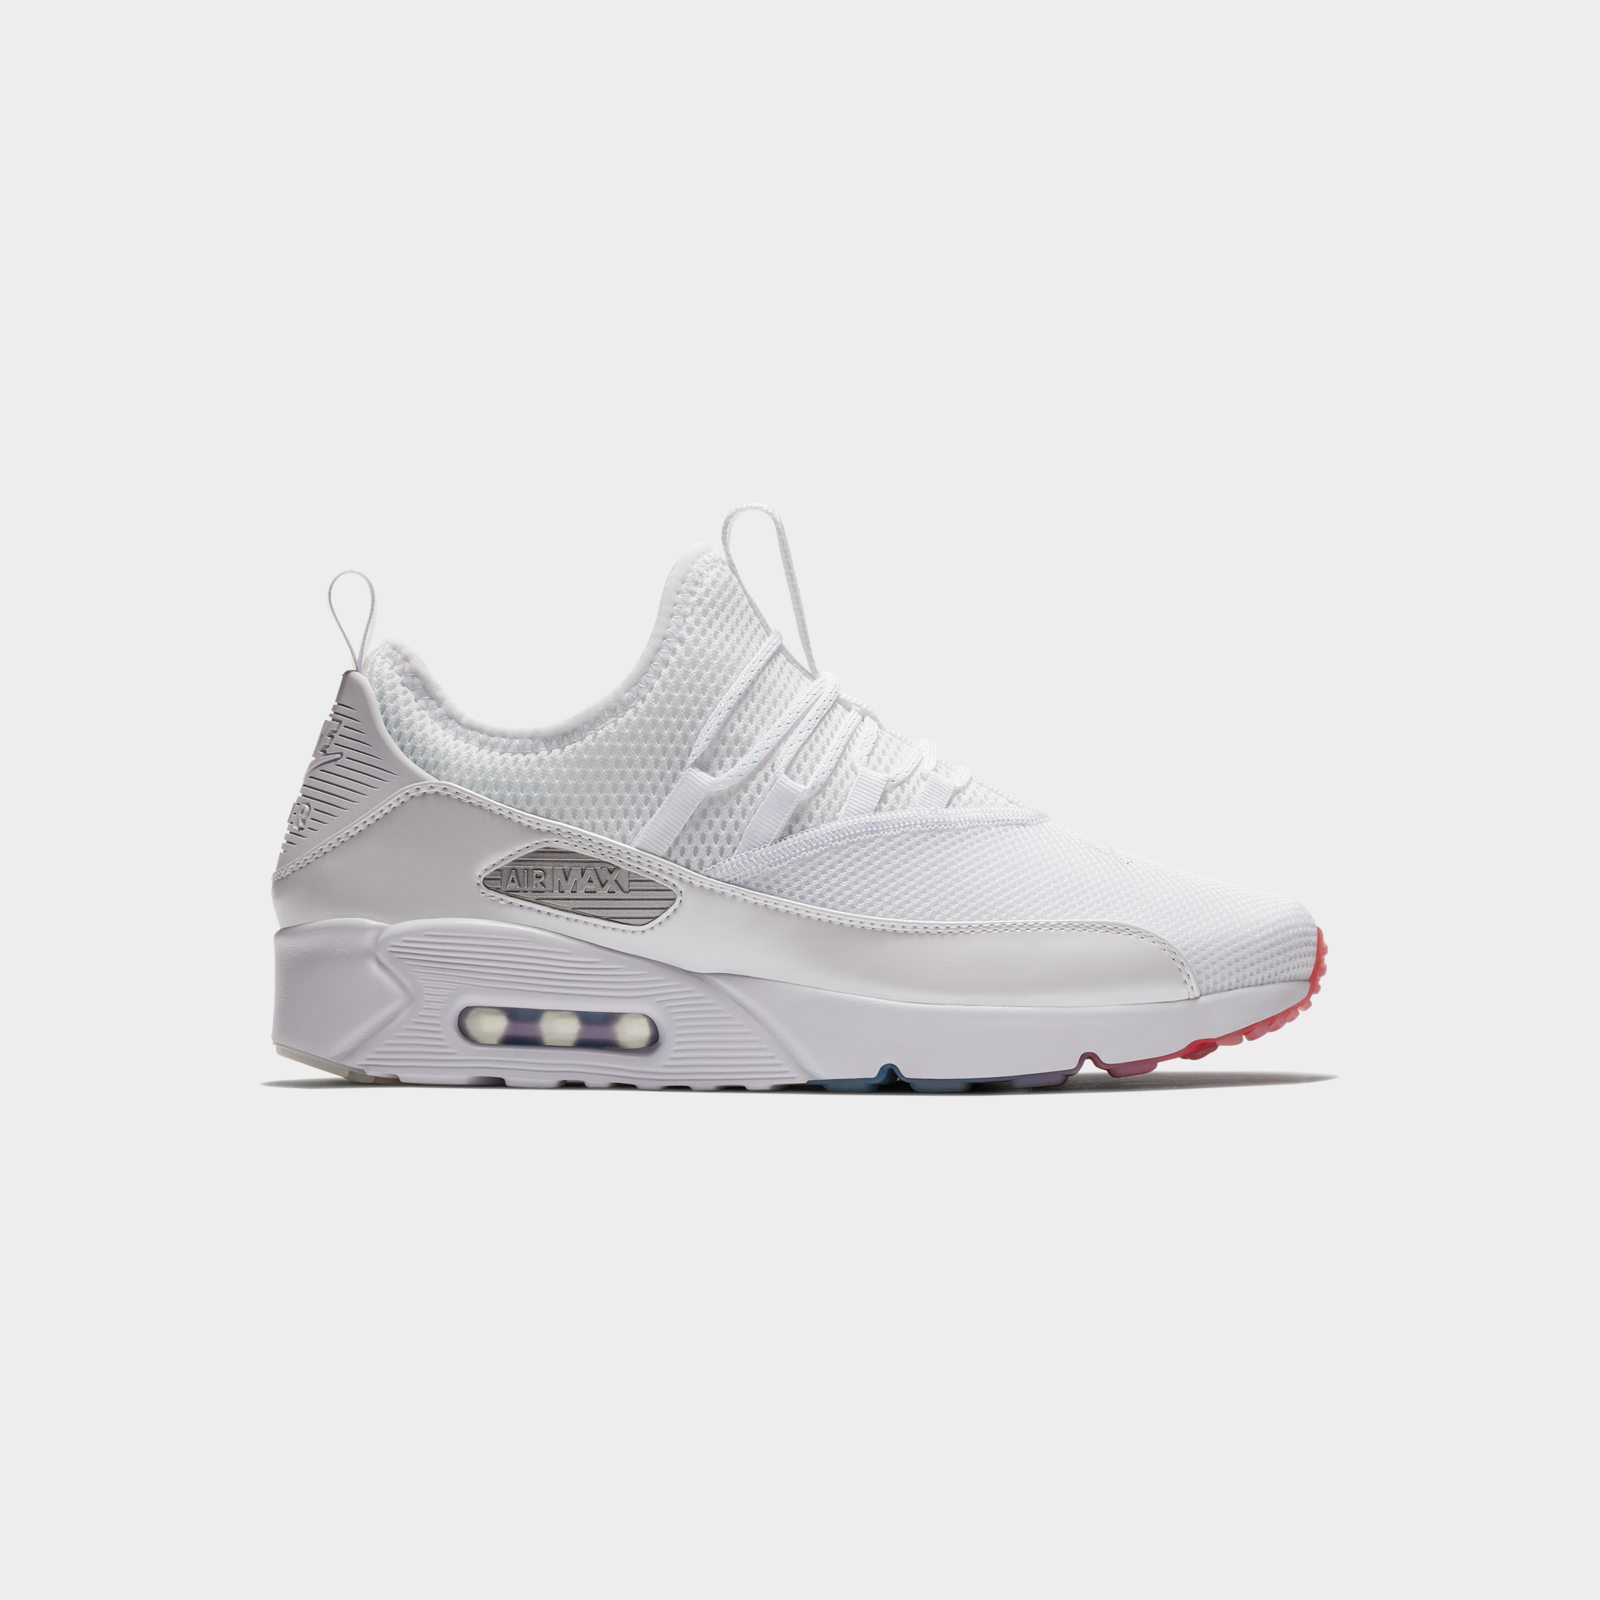 promo code b164d a58a8 Nike Air Max 90 EZ - Aq7980-100 - Sneakersnstuff | sneakers ...